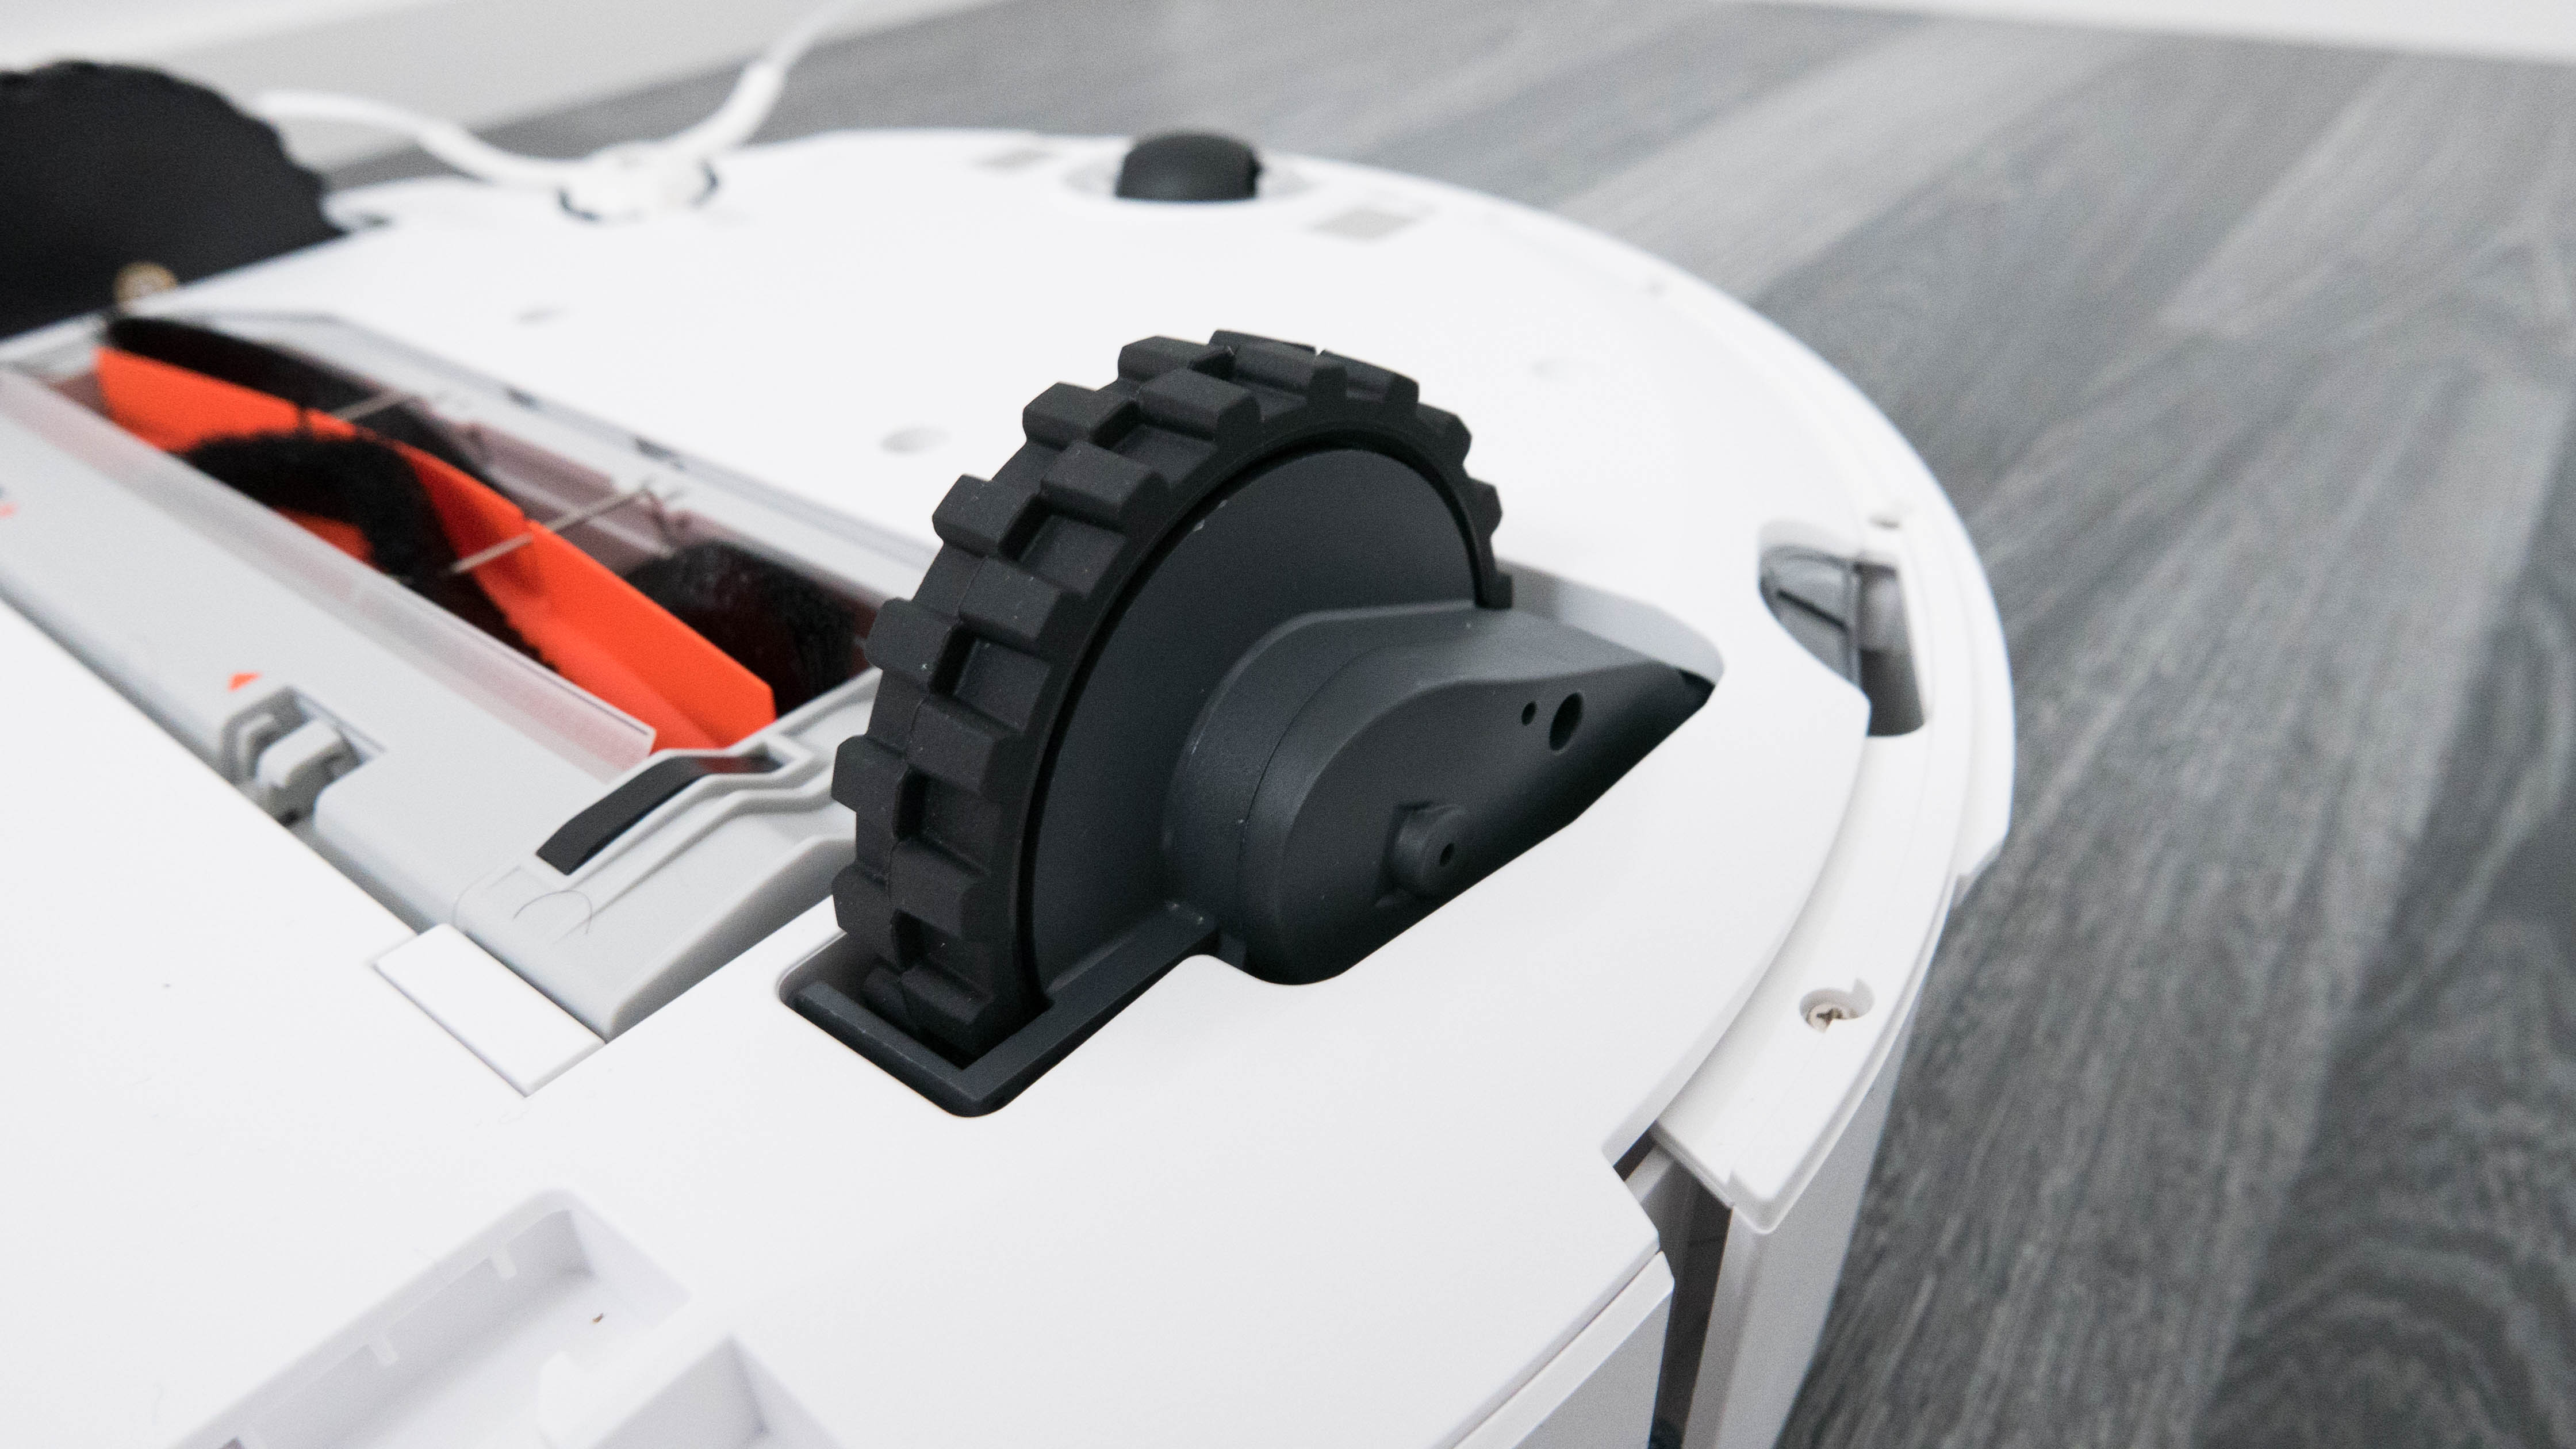 Xiaomi Mi Robot 2 Roborock S50 Roboter Details 30